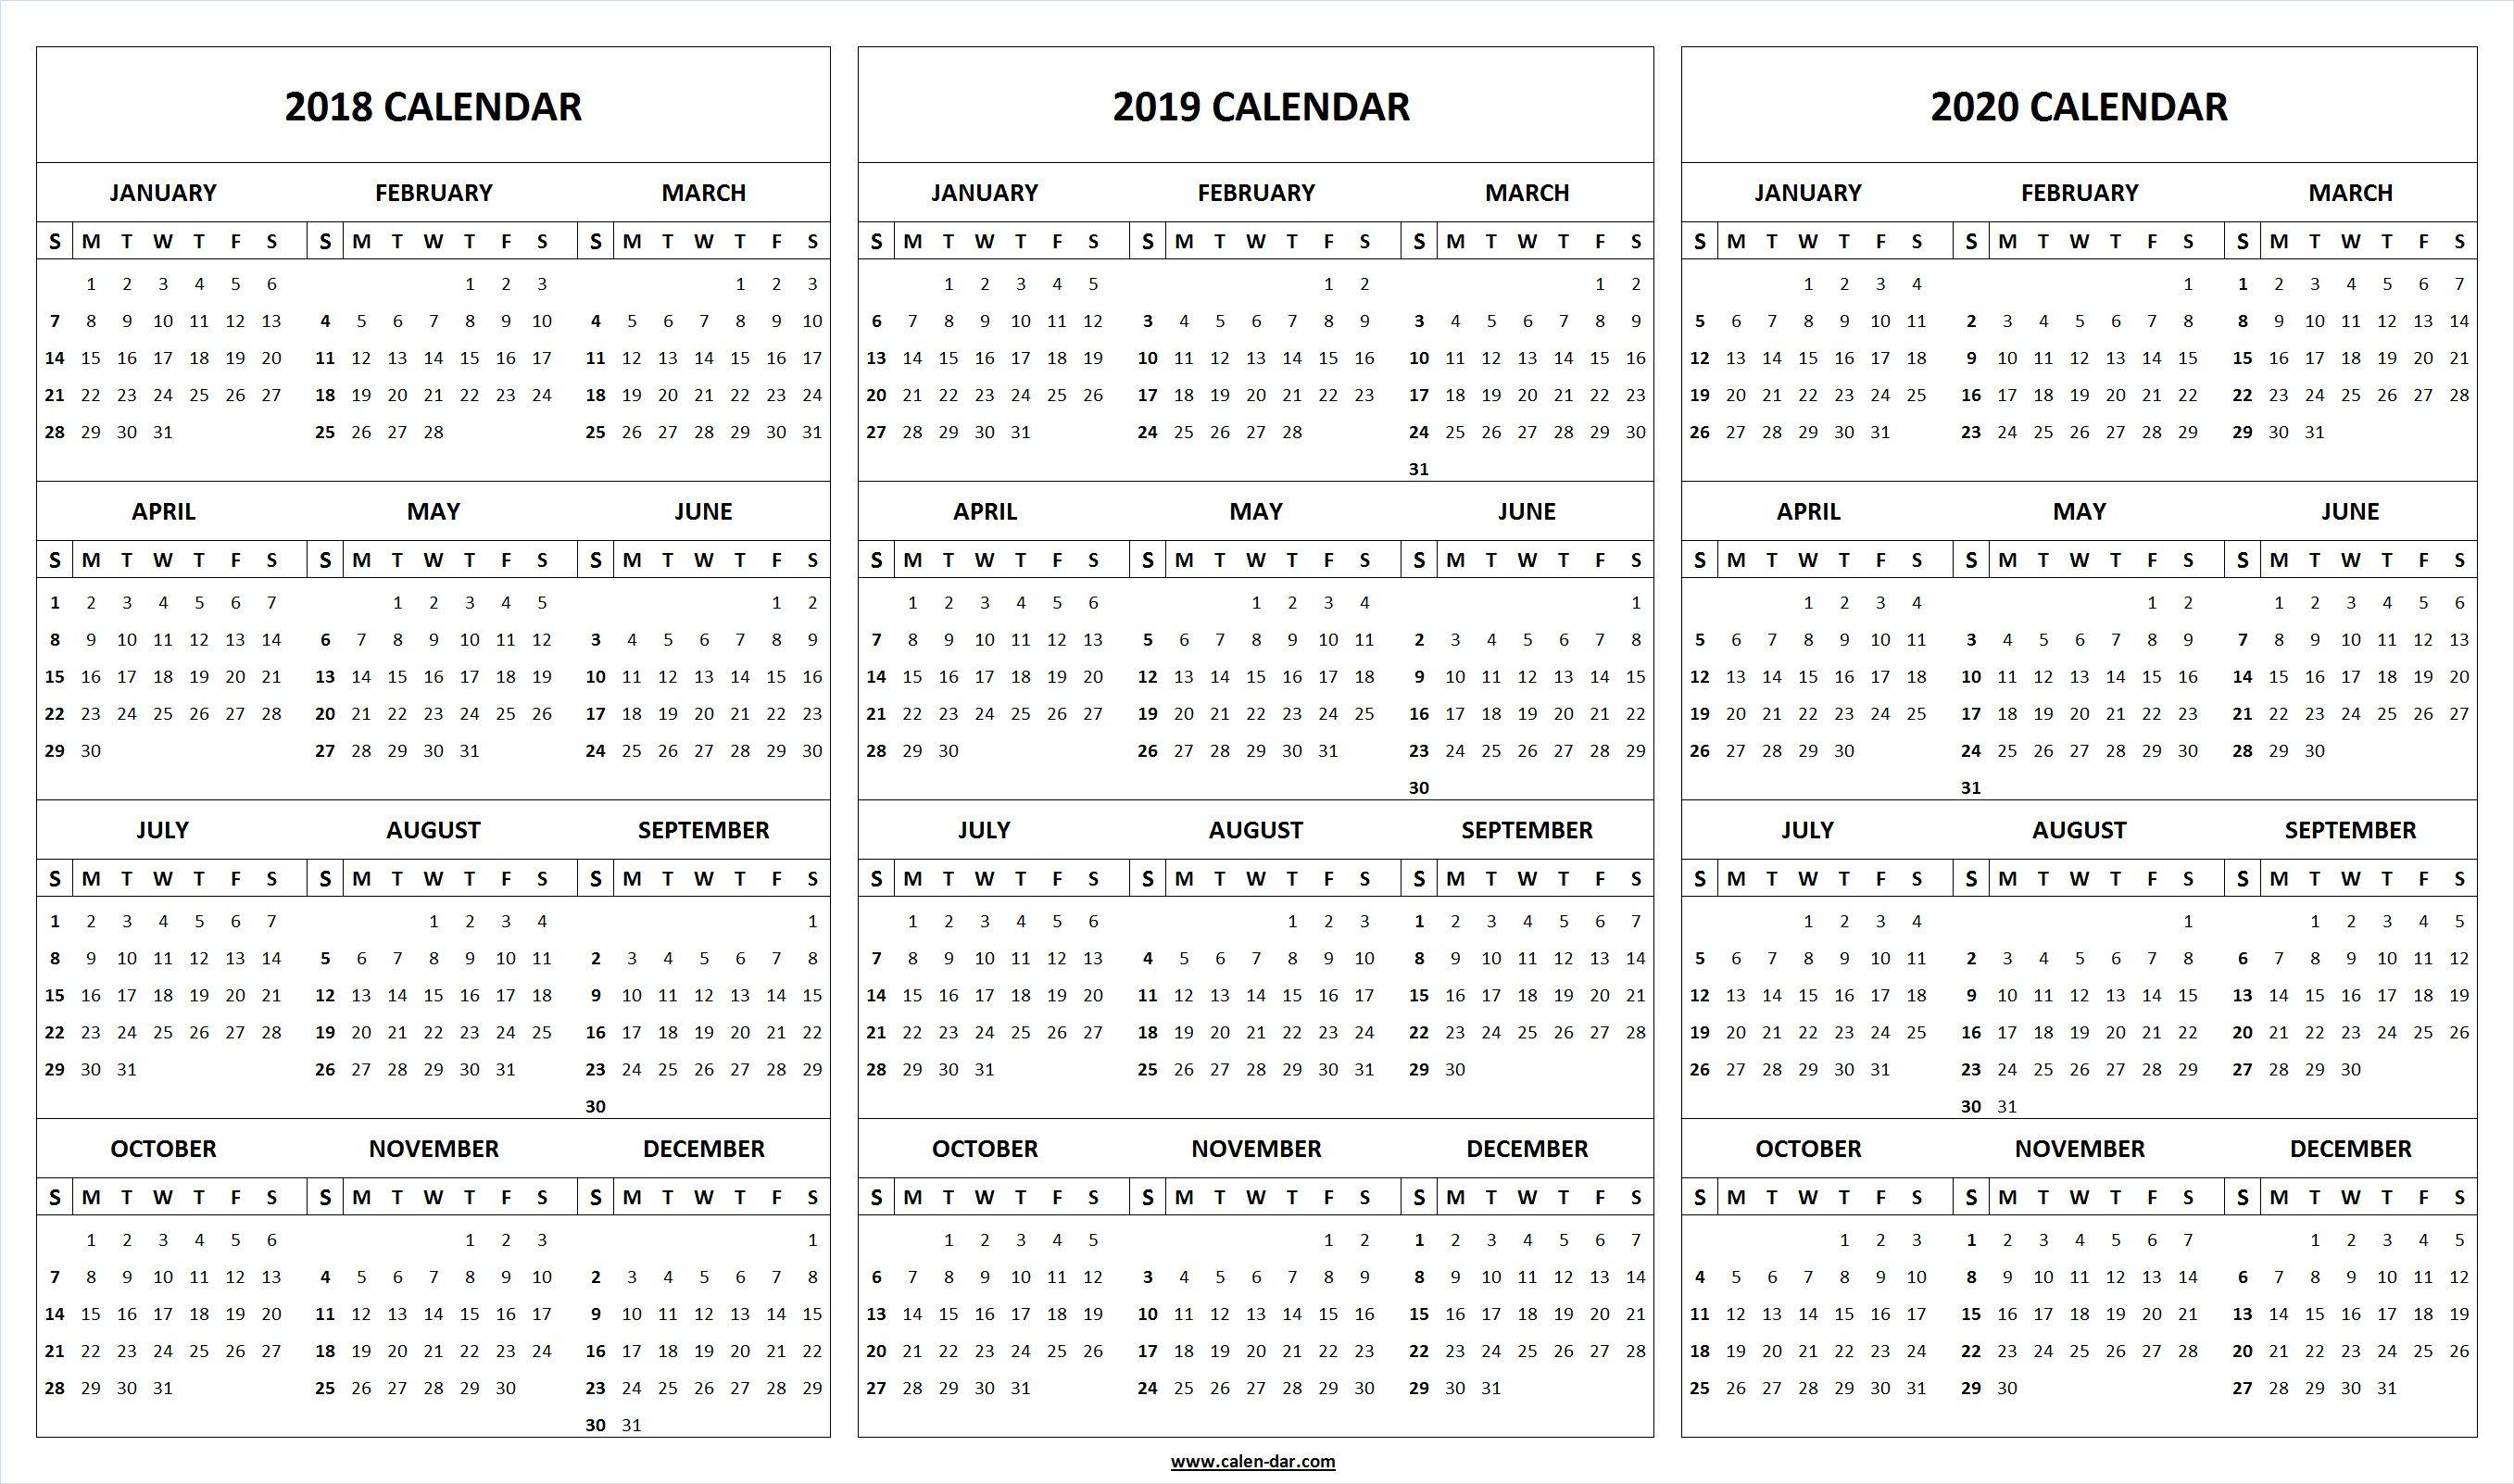 Print Blank 2018 2019 2020 Calendar Template   Organize!   2019 intended for Fiscal Calendar 2019/2020 Free Printable